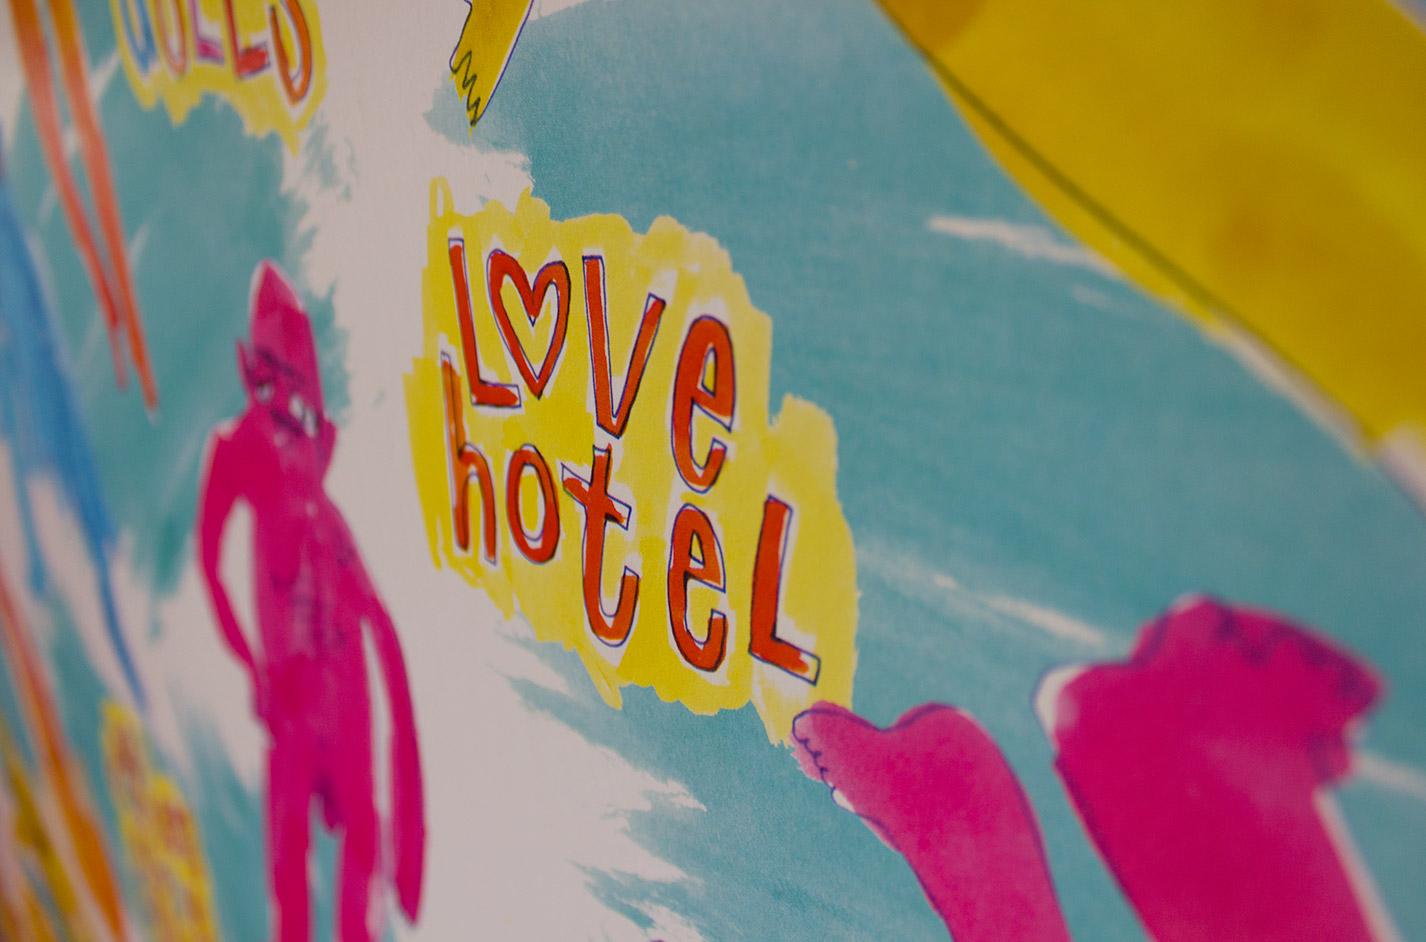 arnhem-hotspot-hotel-modez-02